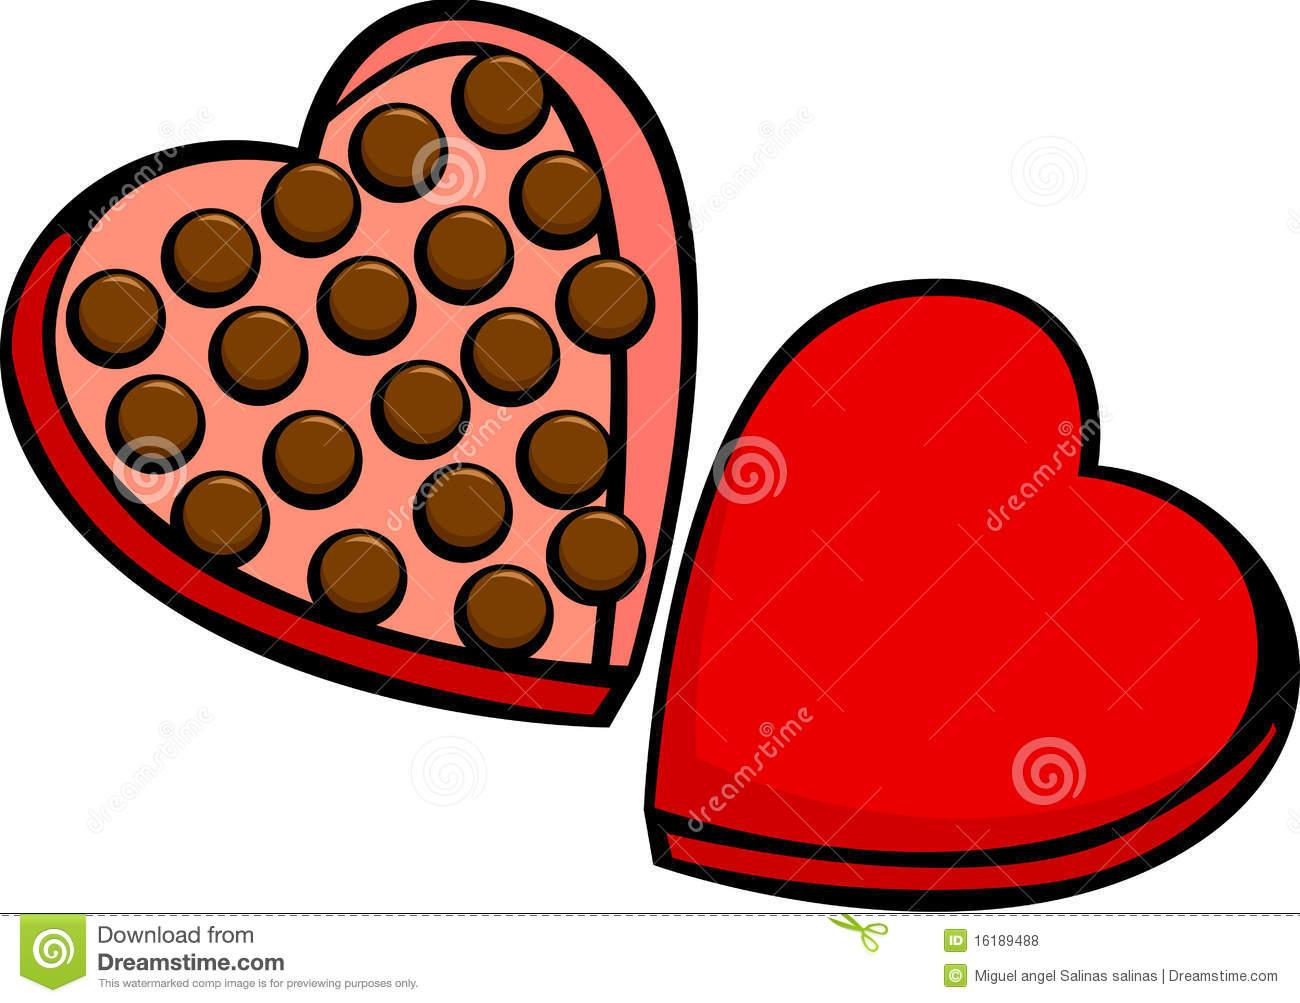 Chocolate clipart box graphic transparent Chocolates Clipart | Free download best Chocolates Clipart on ... graphic transparent